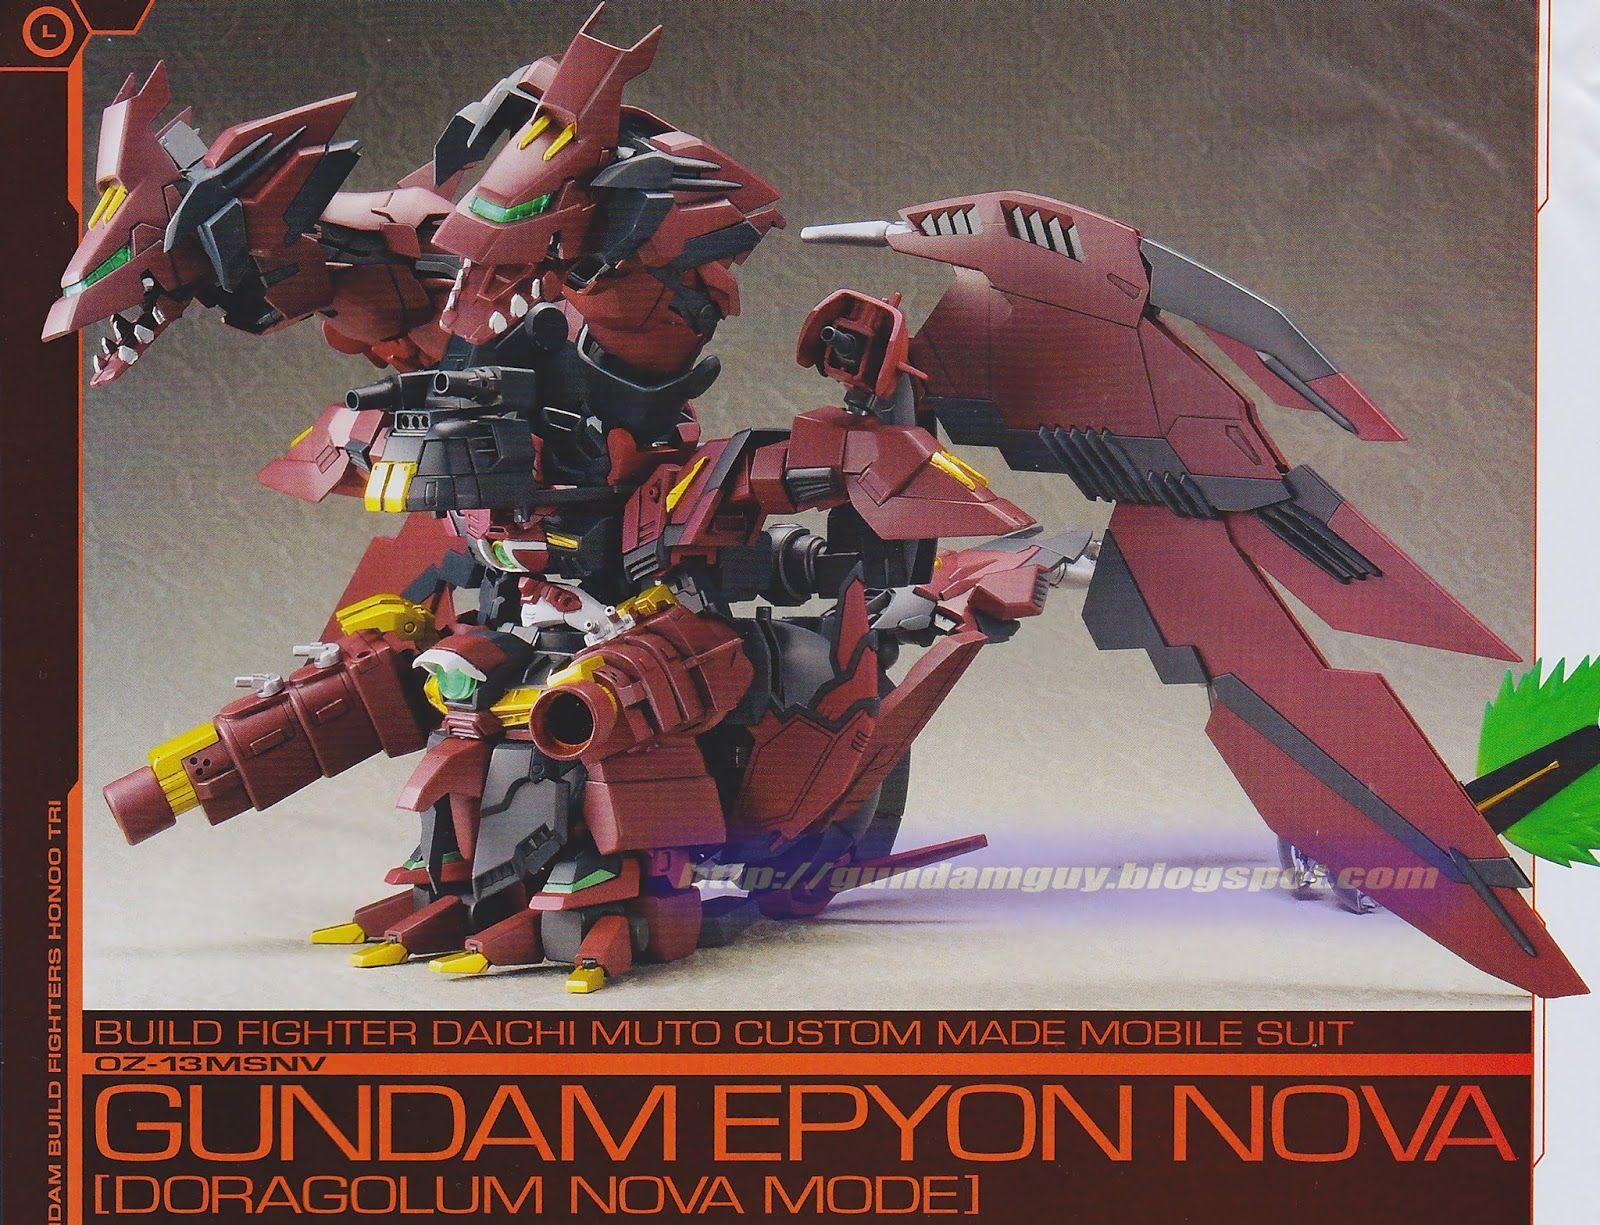 Diagram Gundam Guy Gundam Epyon Nova Doragolum Nova Mode